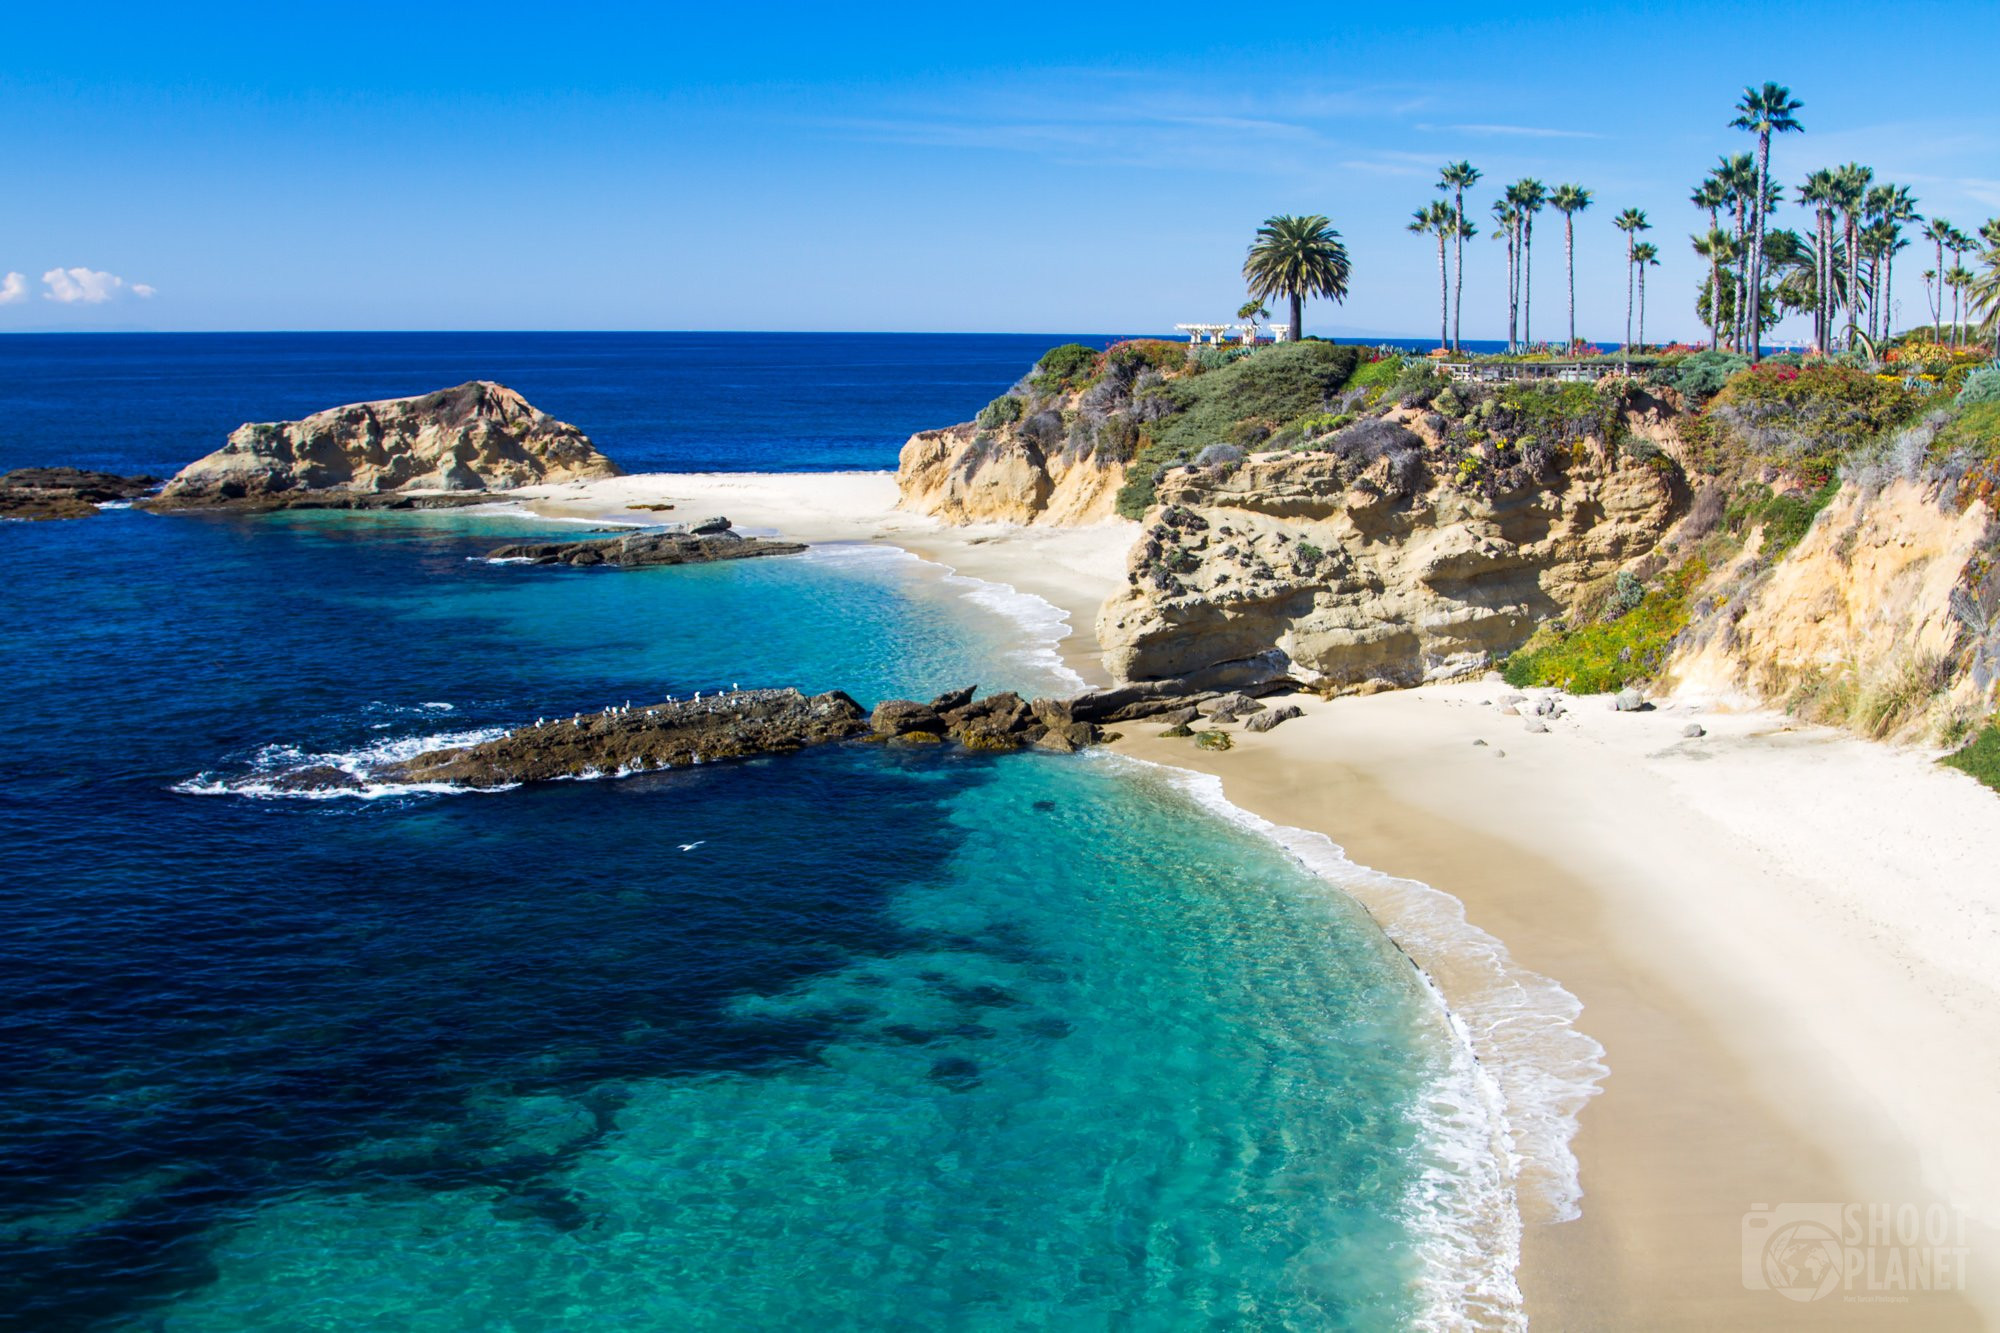 Treasure Island beach, Laguna Beach, California USA